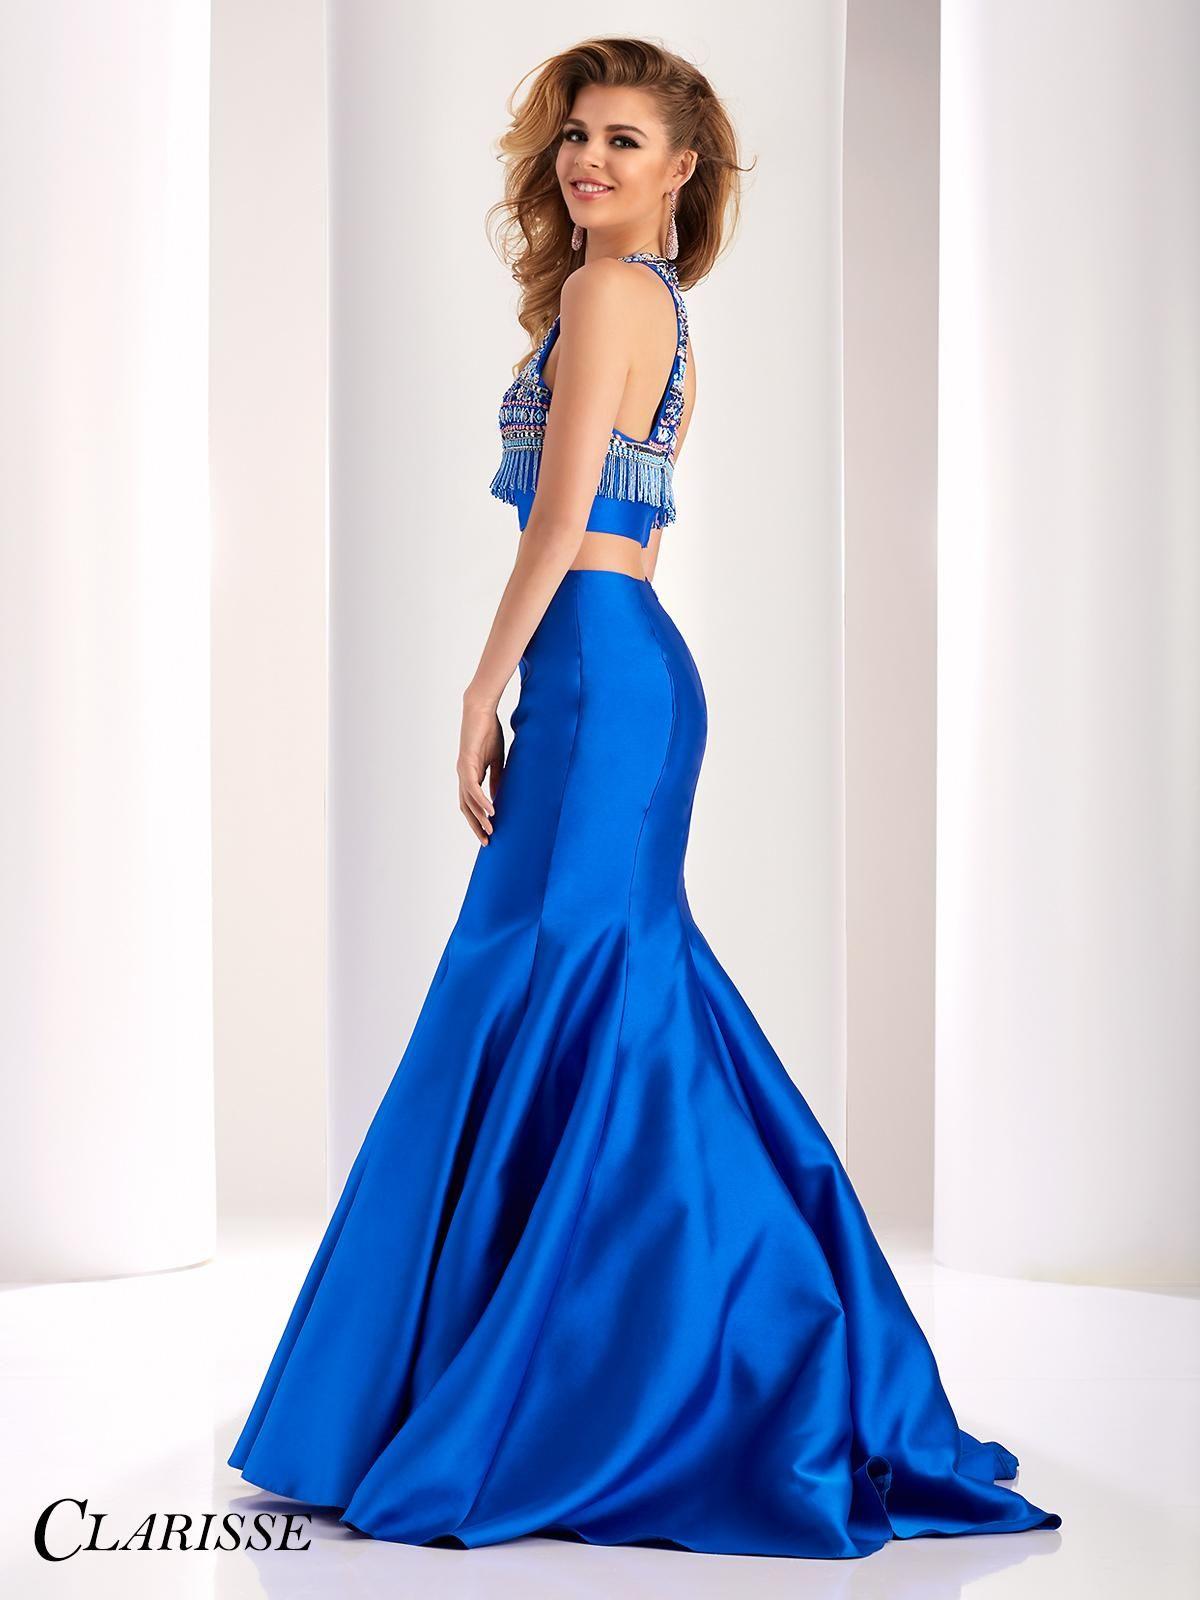 cf1b98fab2c CLARISSE Prom 2017 Two Piece Dress Style 4837. This sleeveless Mikado Clarisse  dress